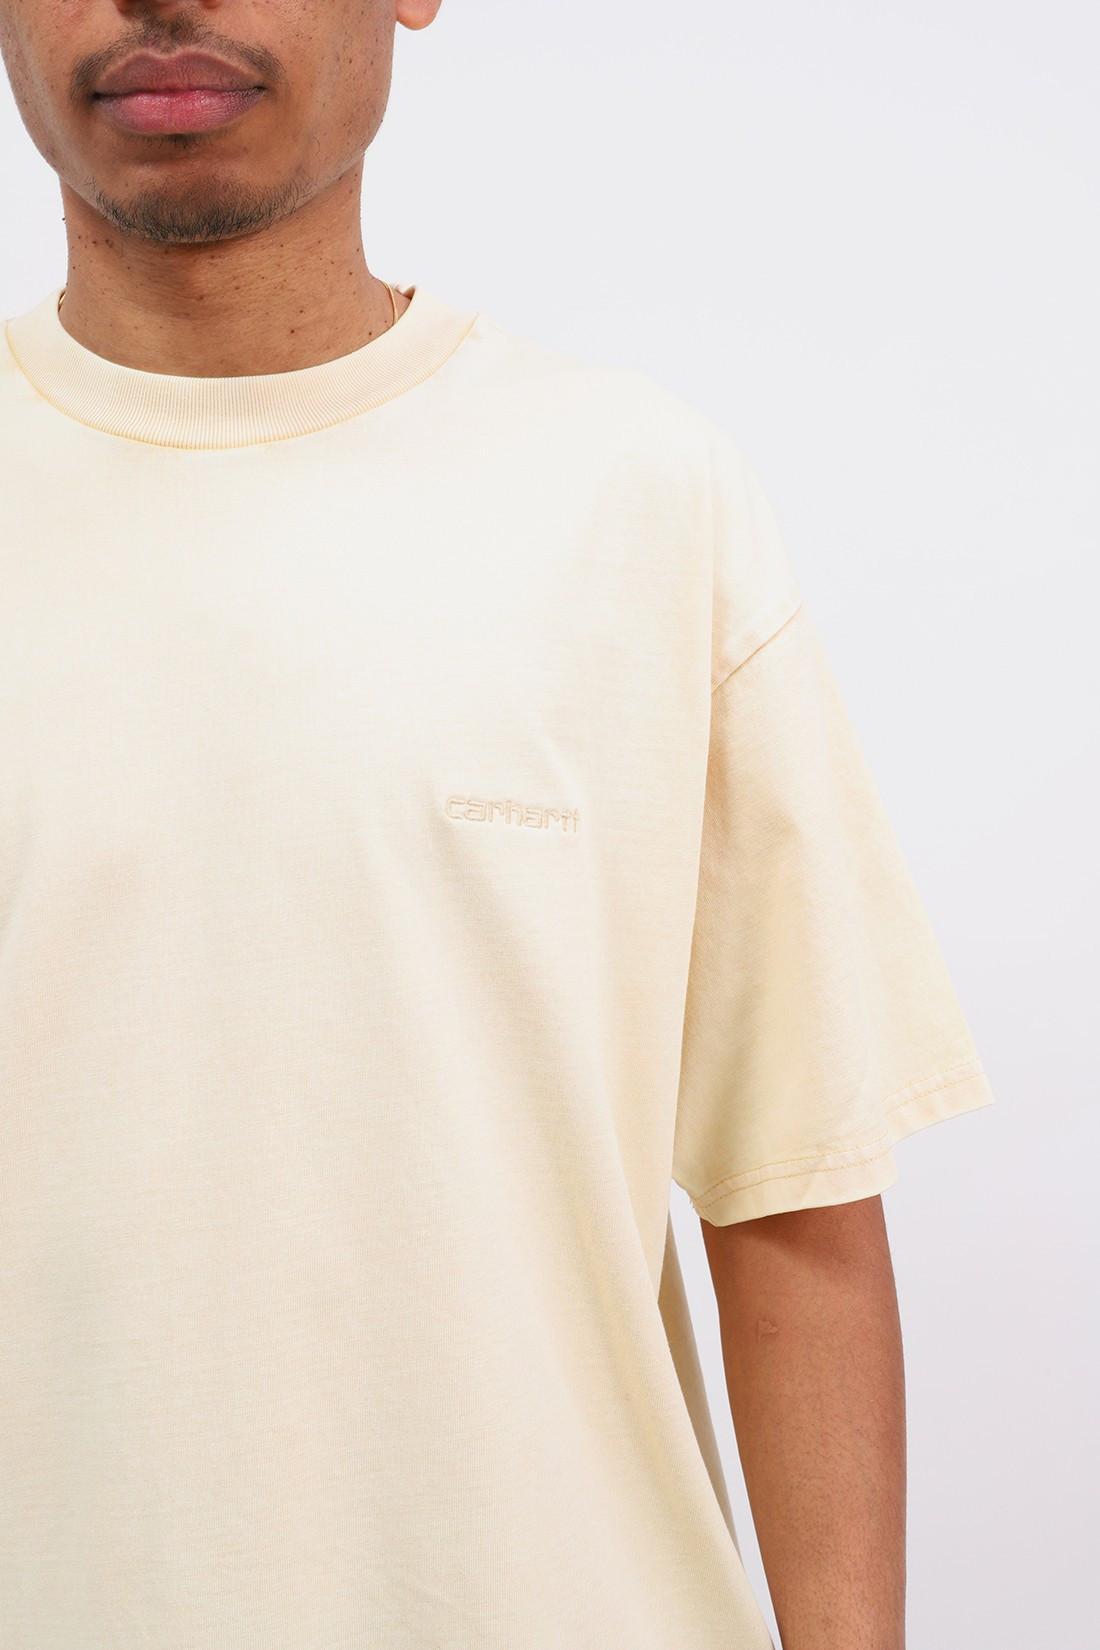 CARHARTT WIP / S/s mosby script t-shirt Dusty h brown wash